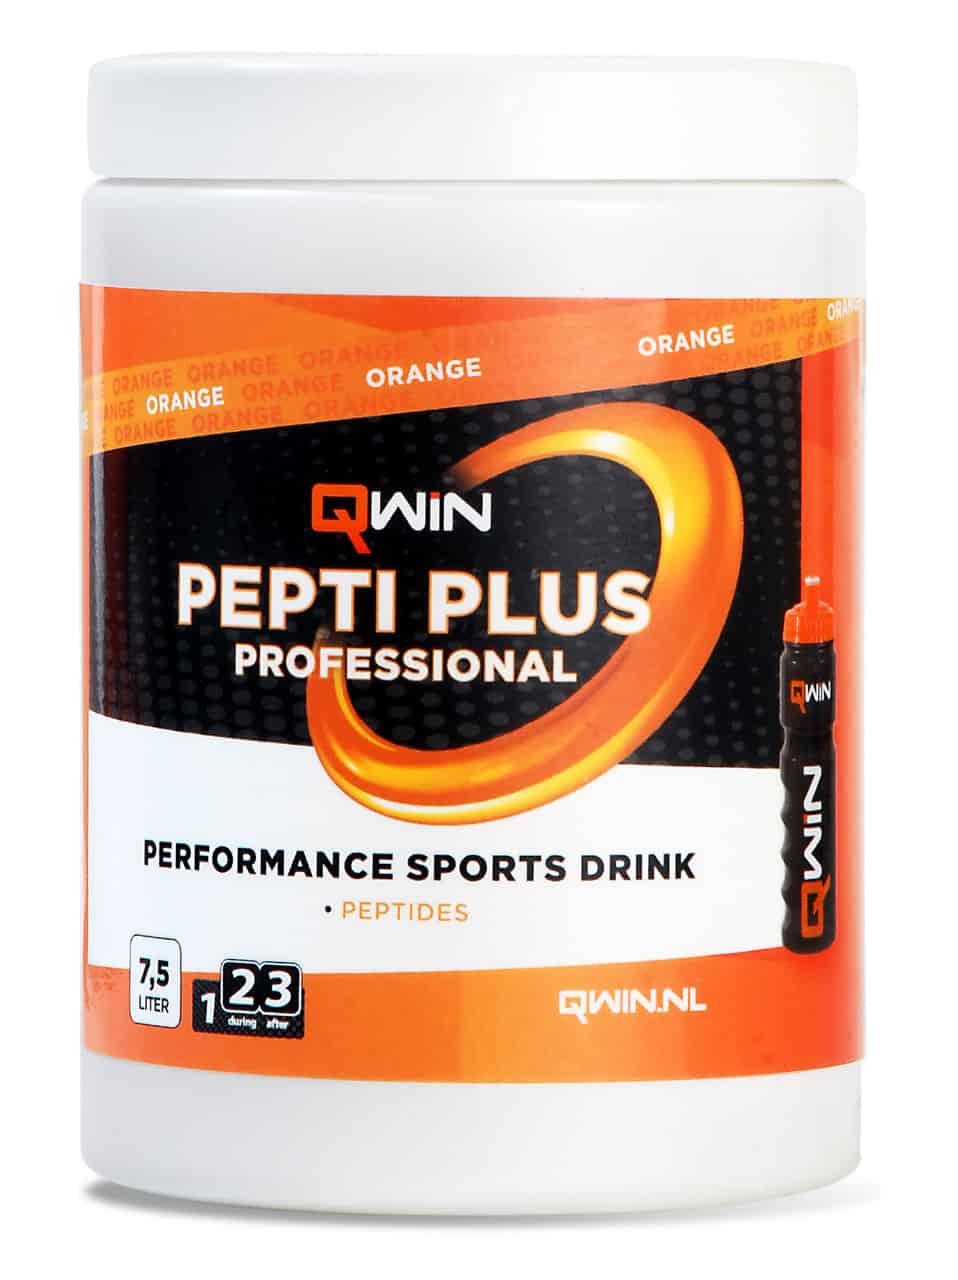 QWIN PeptiPlus Orange 75 liter